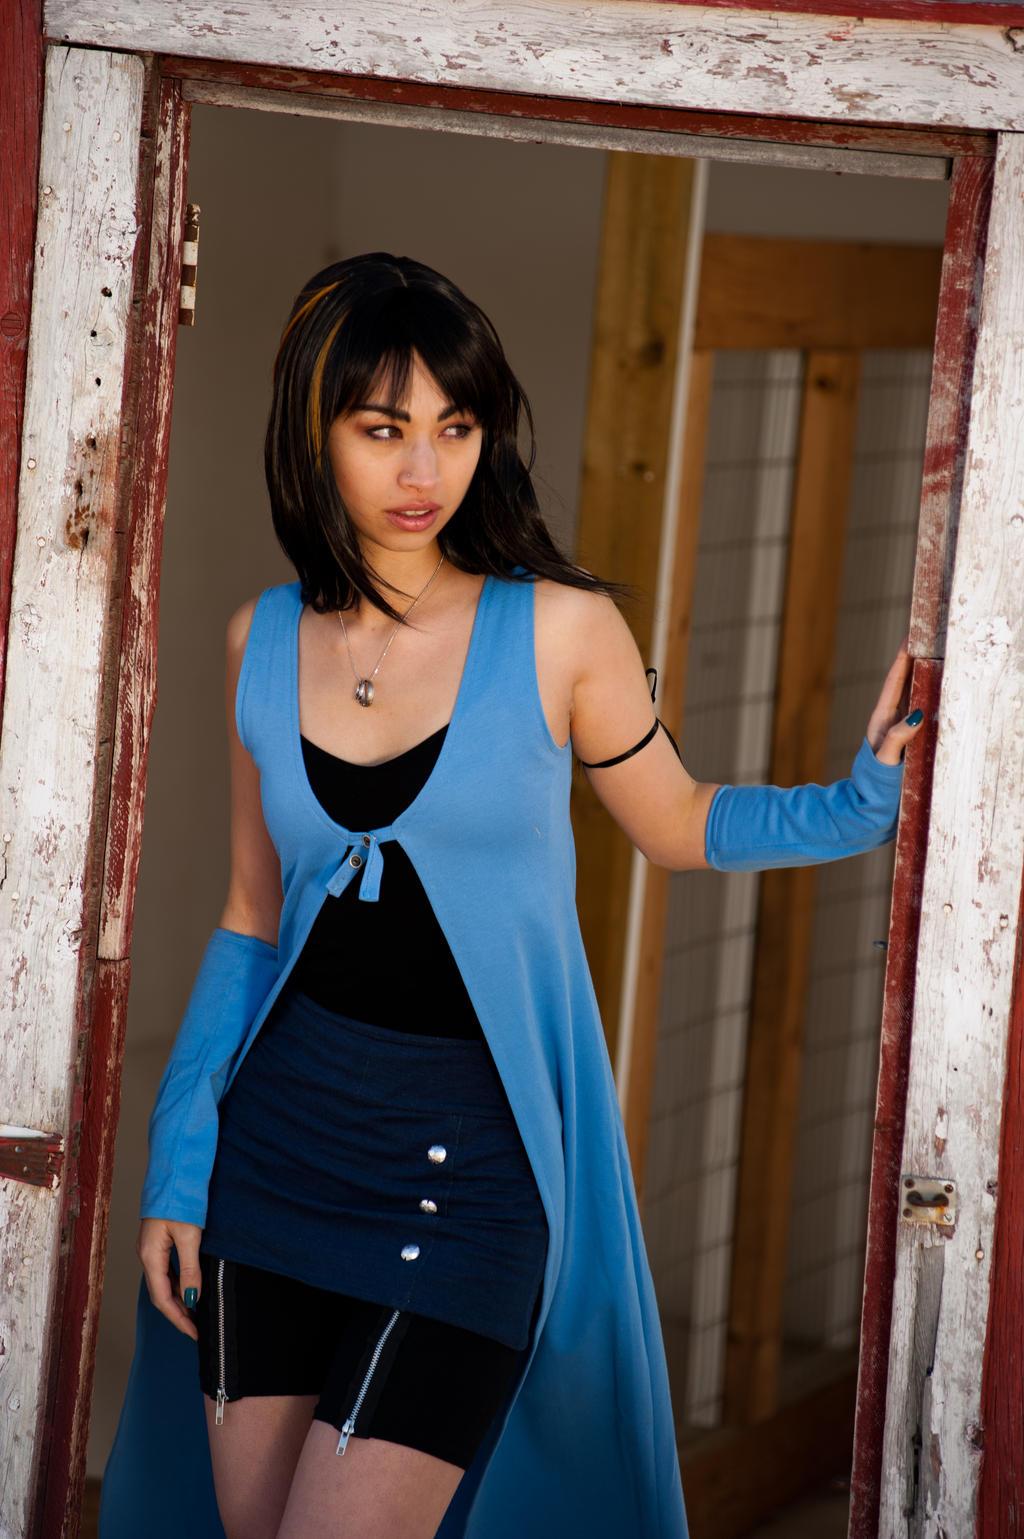 Vanessa Rinoa 2a by jagged-eye